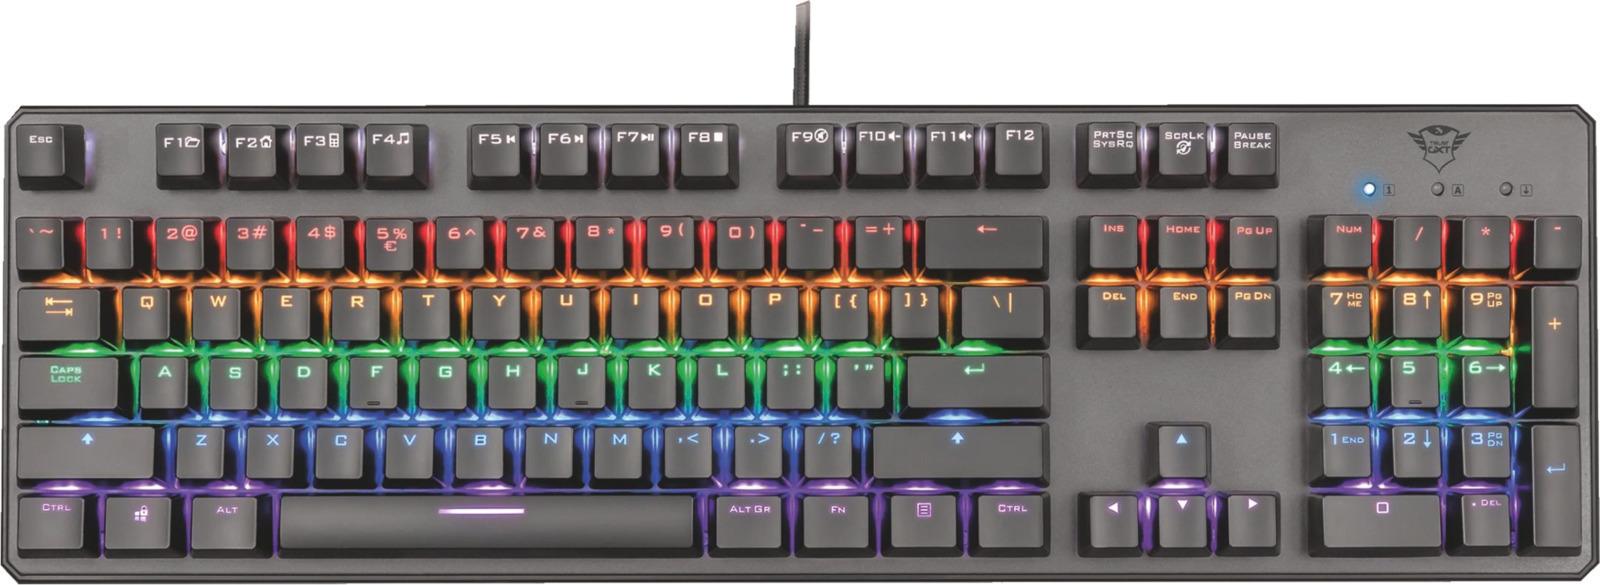 Trust GXT 865 Asta Mechanical Keyboard - USB (22630) - Πληρωμή και σε έως 36 Δόσεις!!!